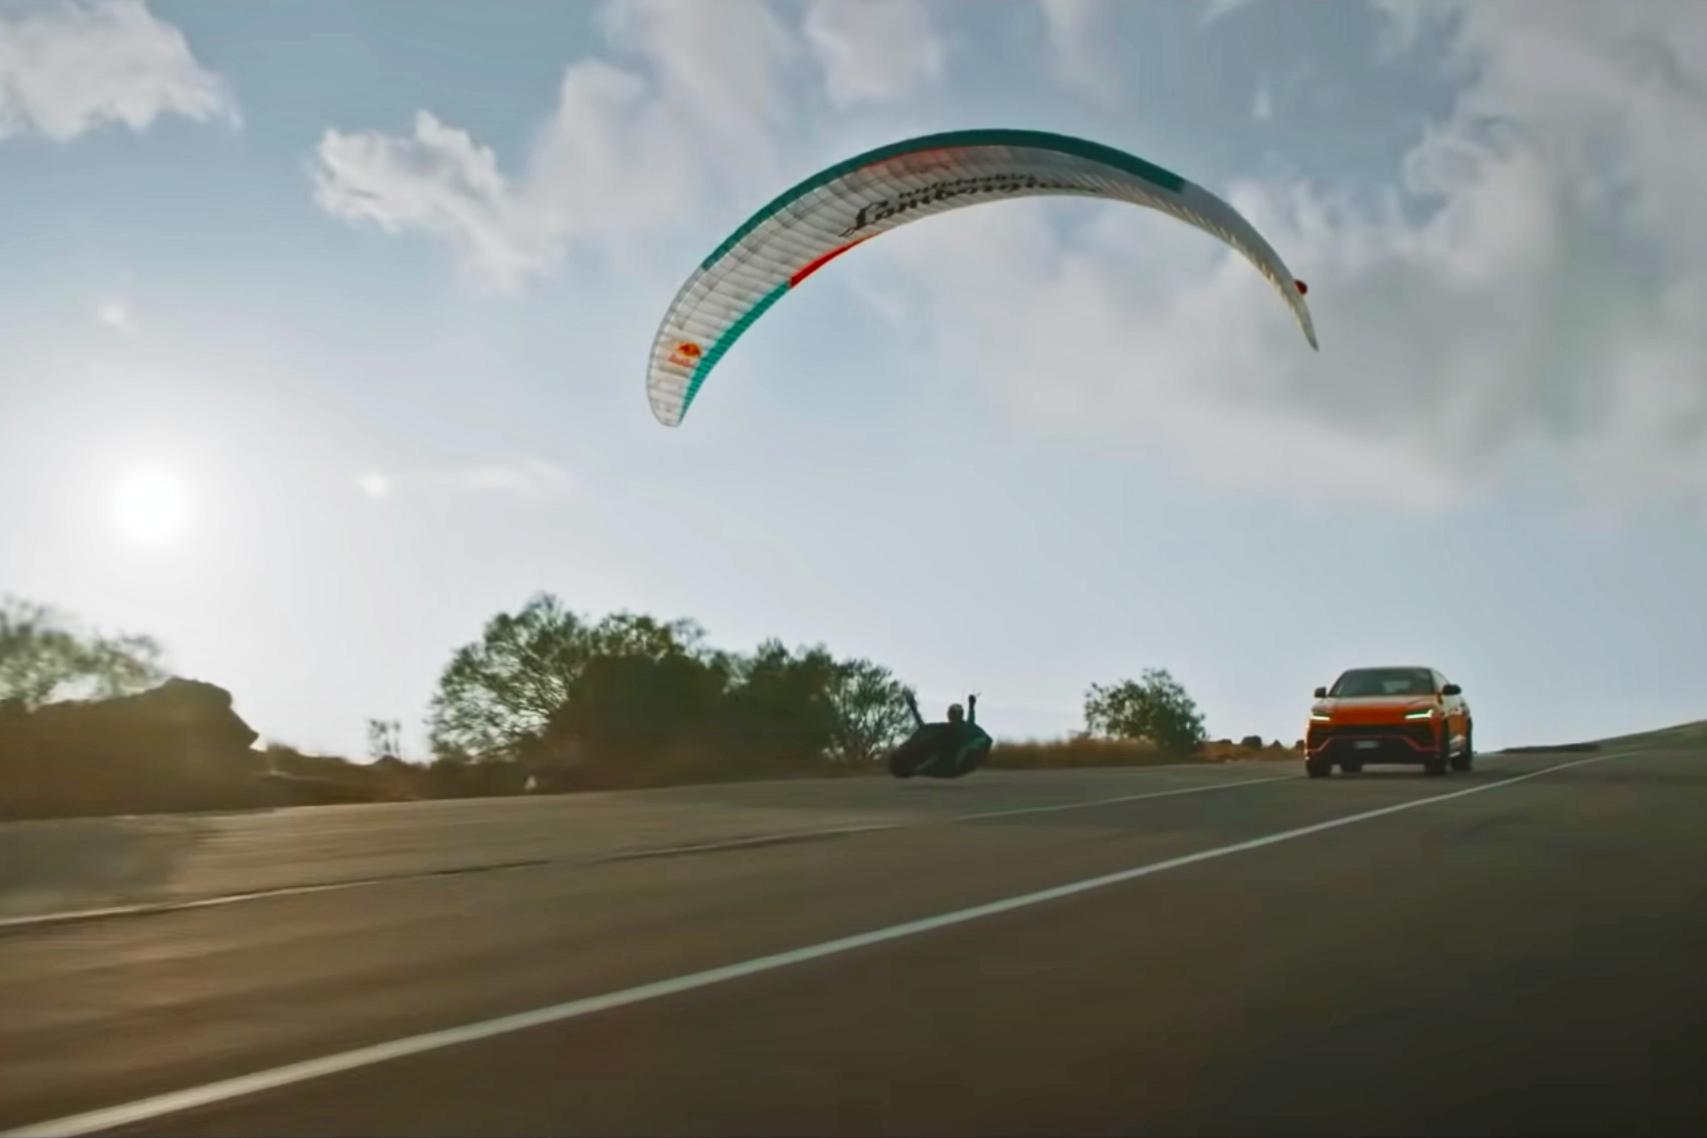 Lamborghini Urus and paraglider on pavement